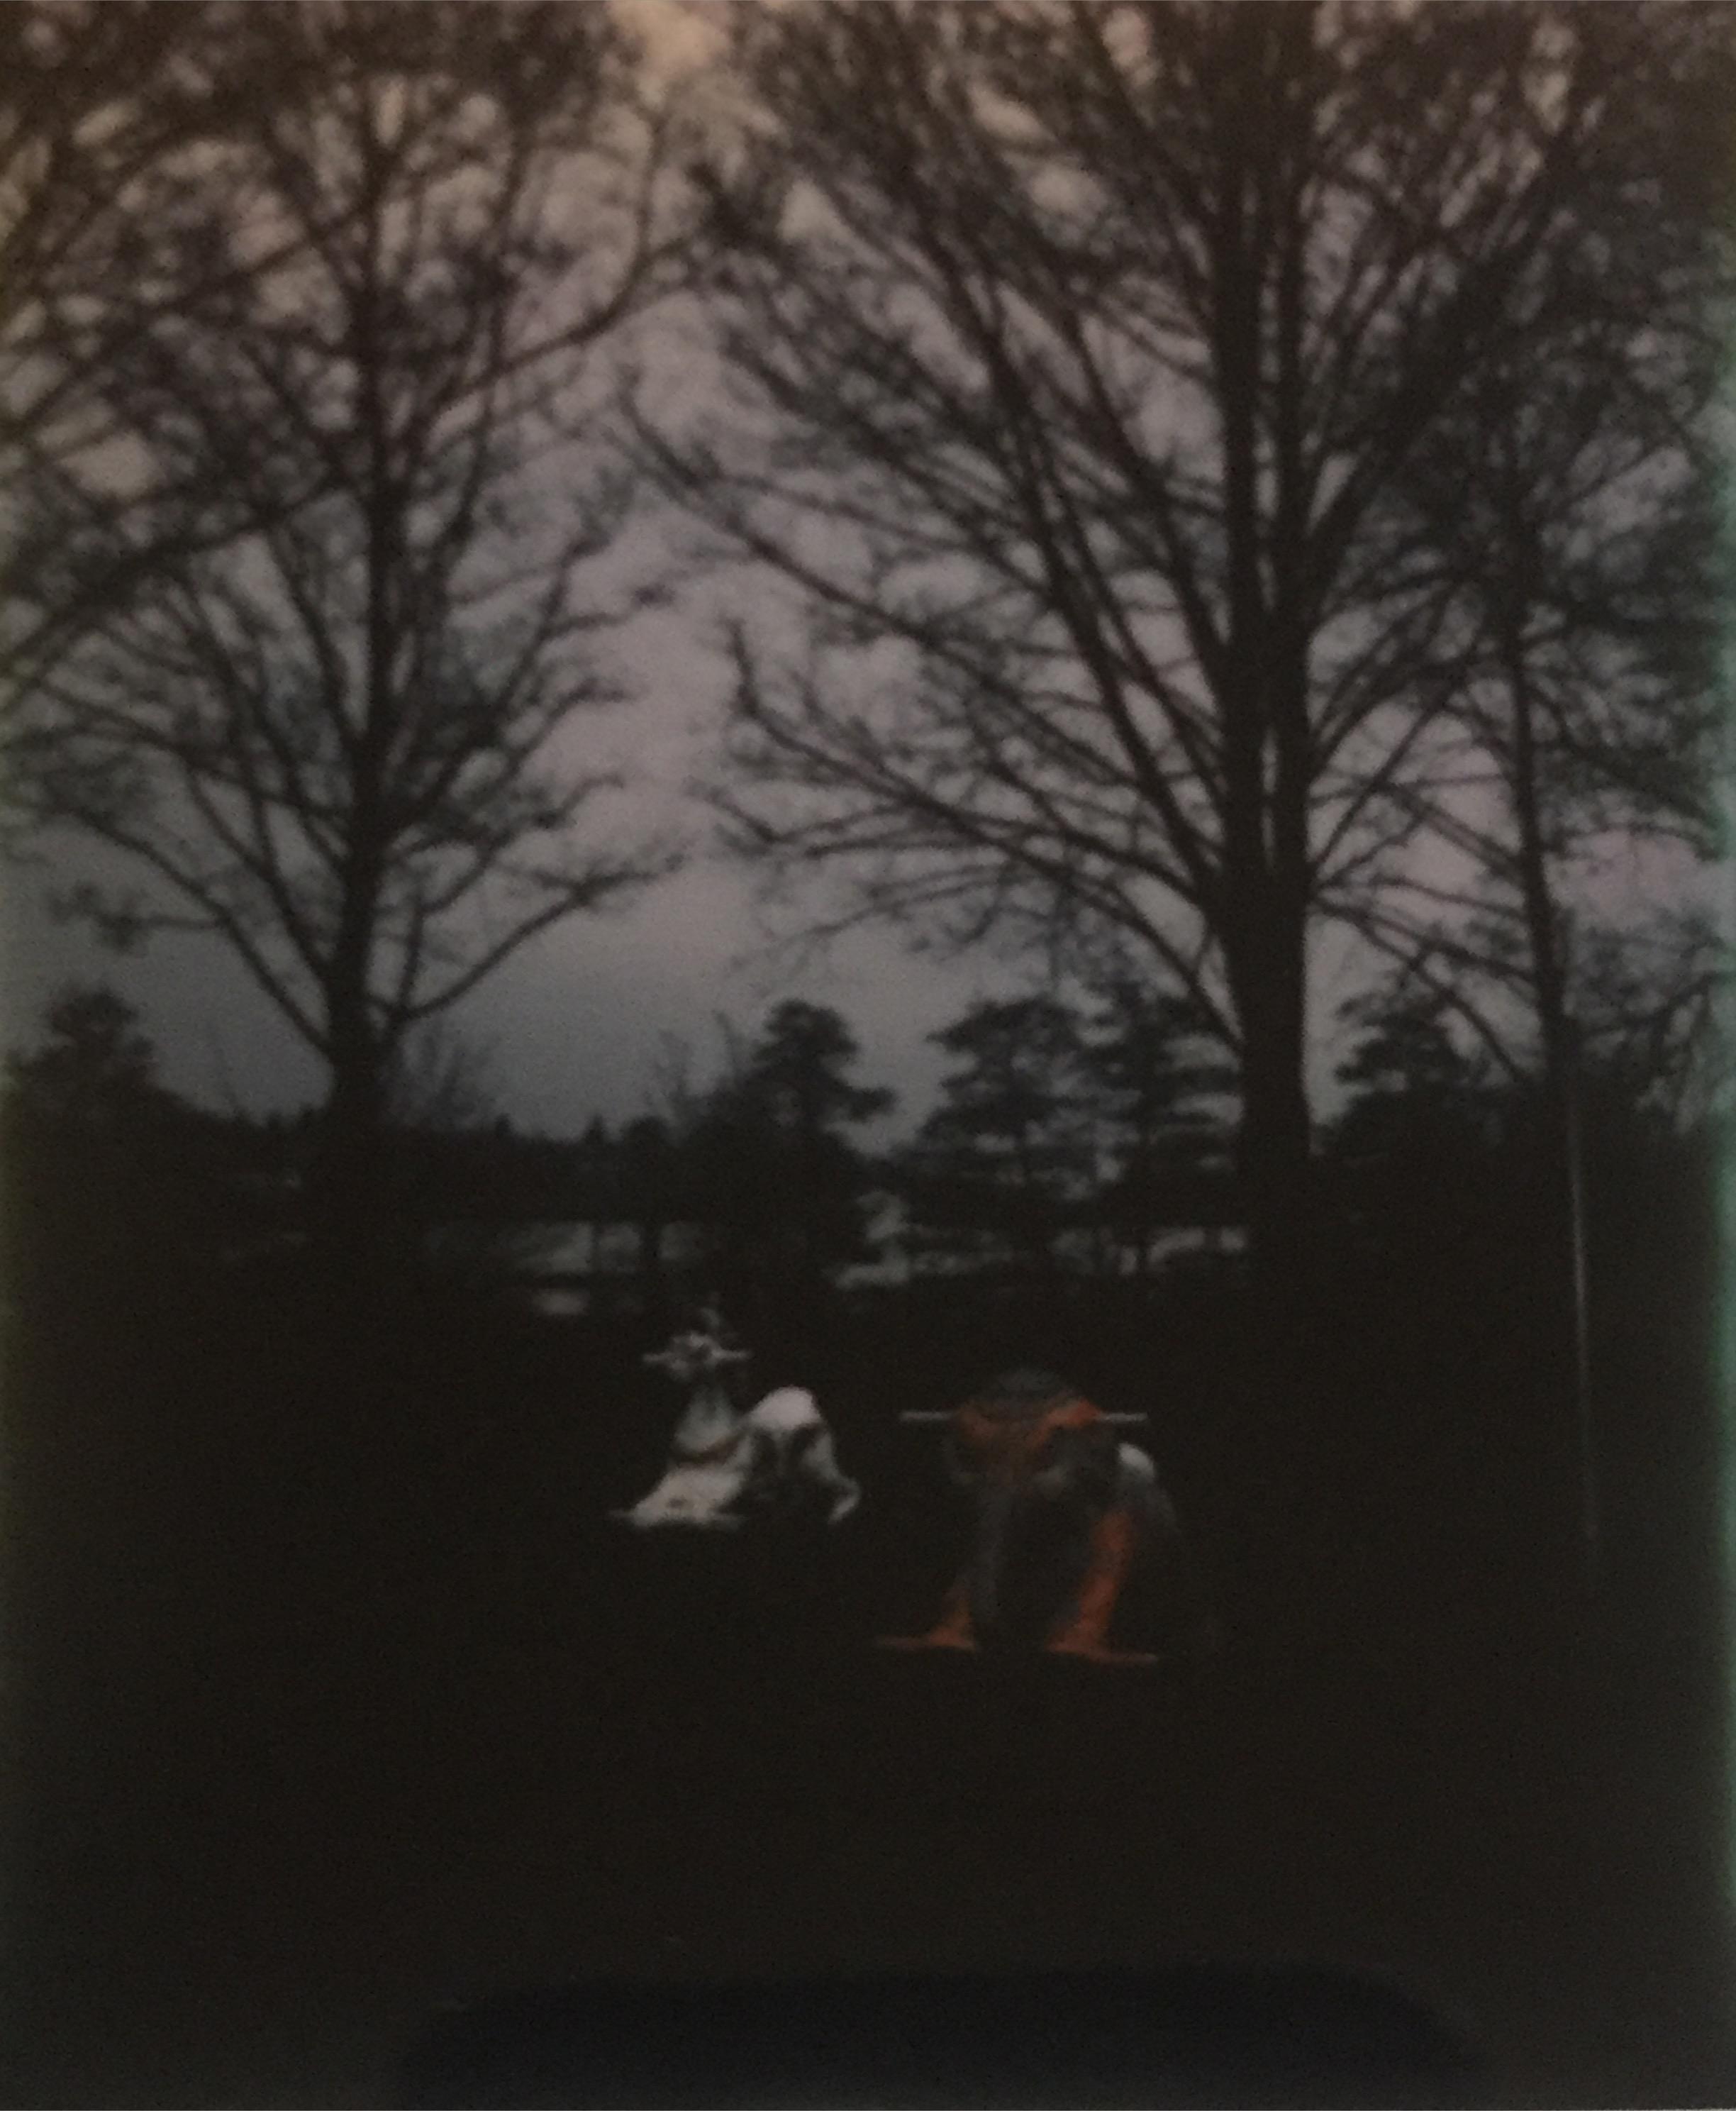 IMG_1970.JPG